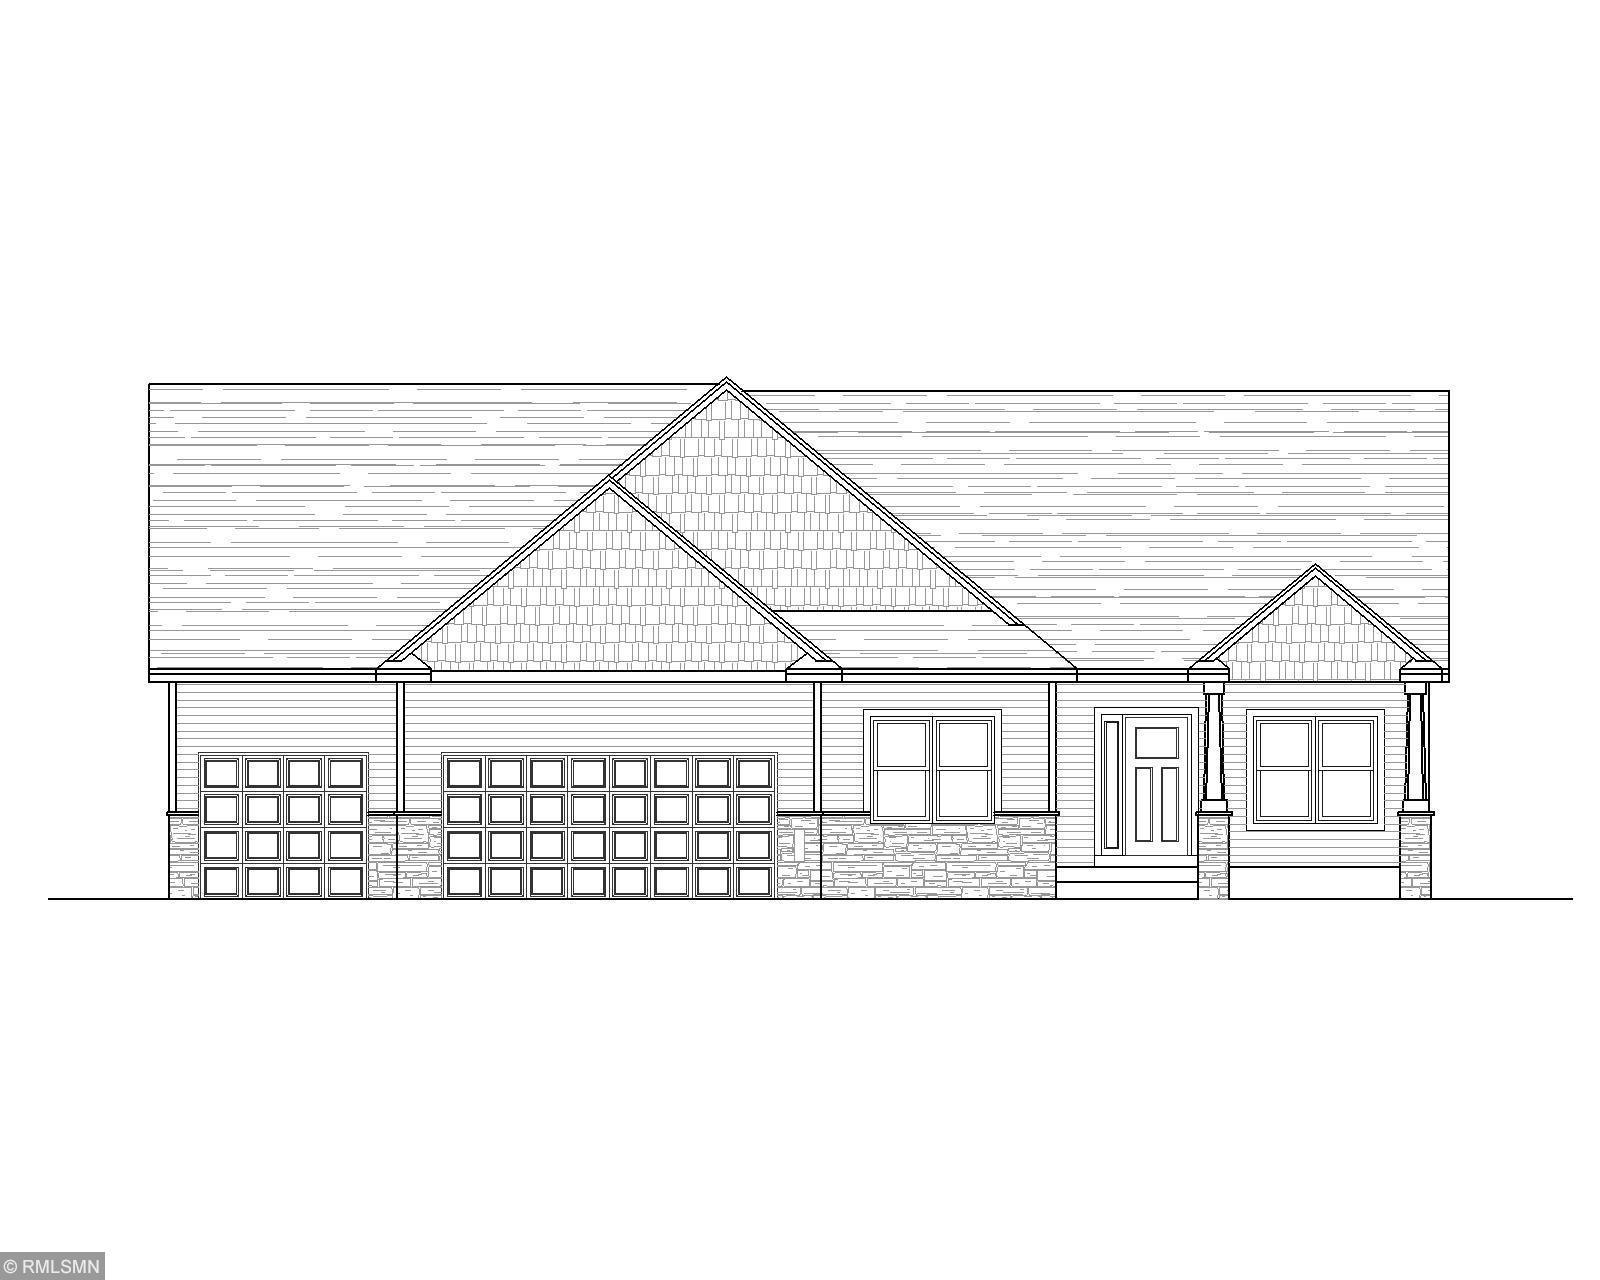 XX43 504 Avenue Property Photo - Oak Grove Twp, WI real estate listing